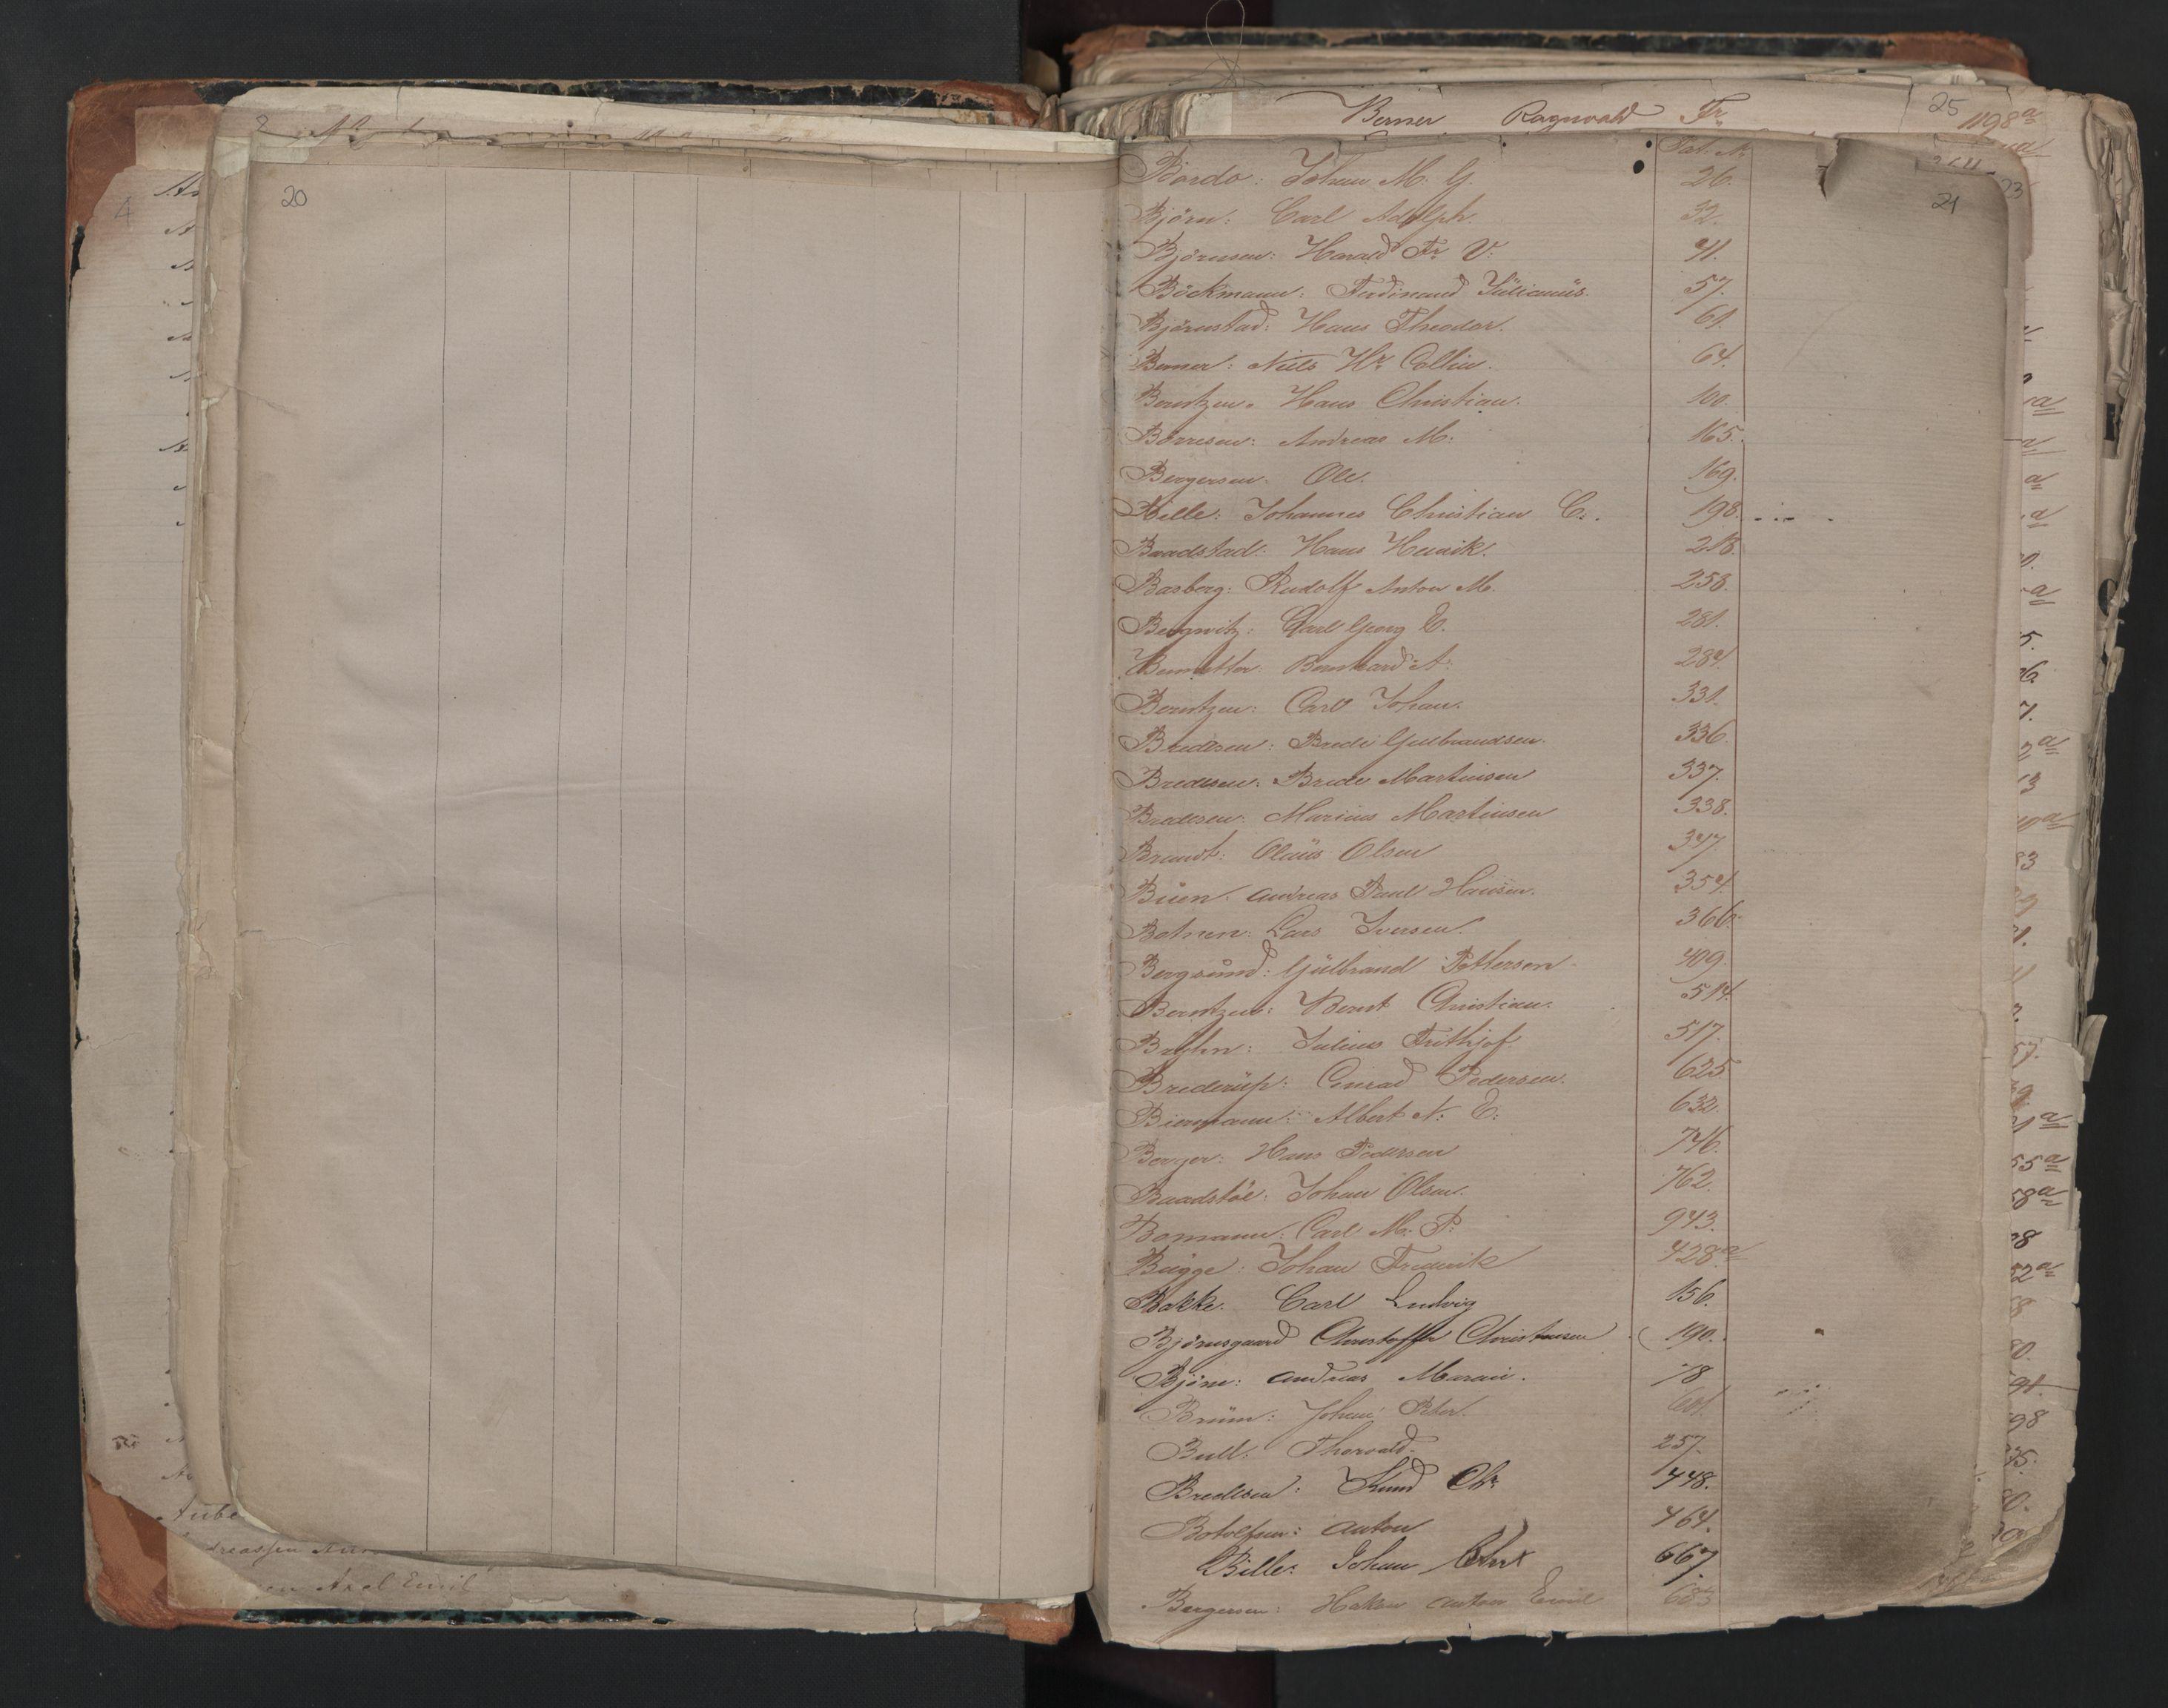 SAO, Oslo sjømannskontor, F/Fa/L0001: Register for Kristiania krets, 1866-1891, s. 20-21